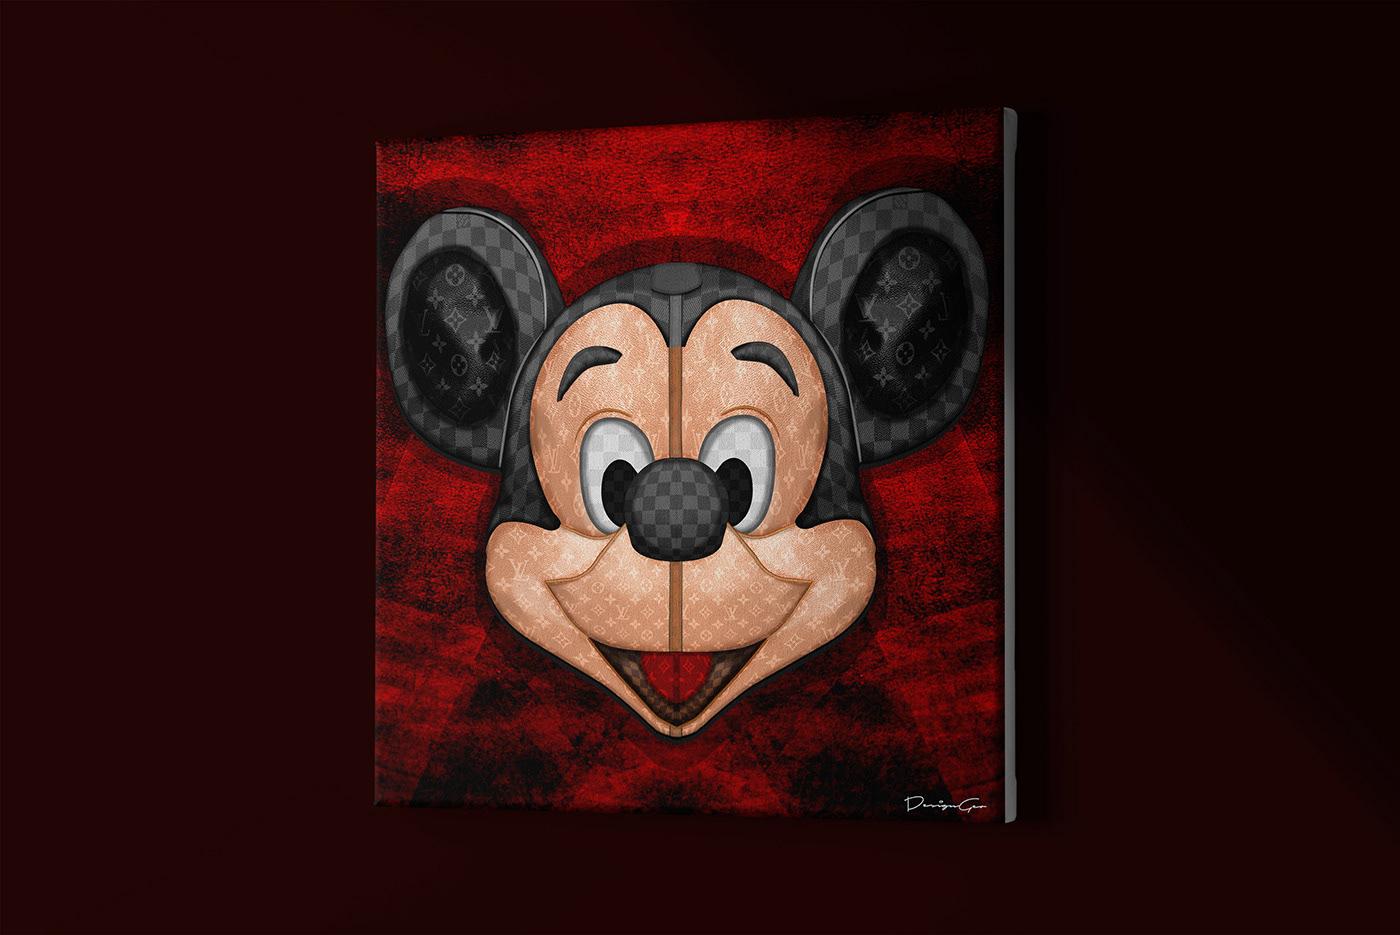 Digital illustration of a Louis Vuitton Mickey Mouse. Technique: Photoshop. DesignGeo